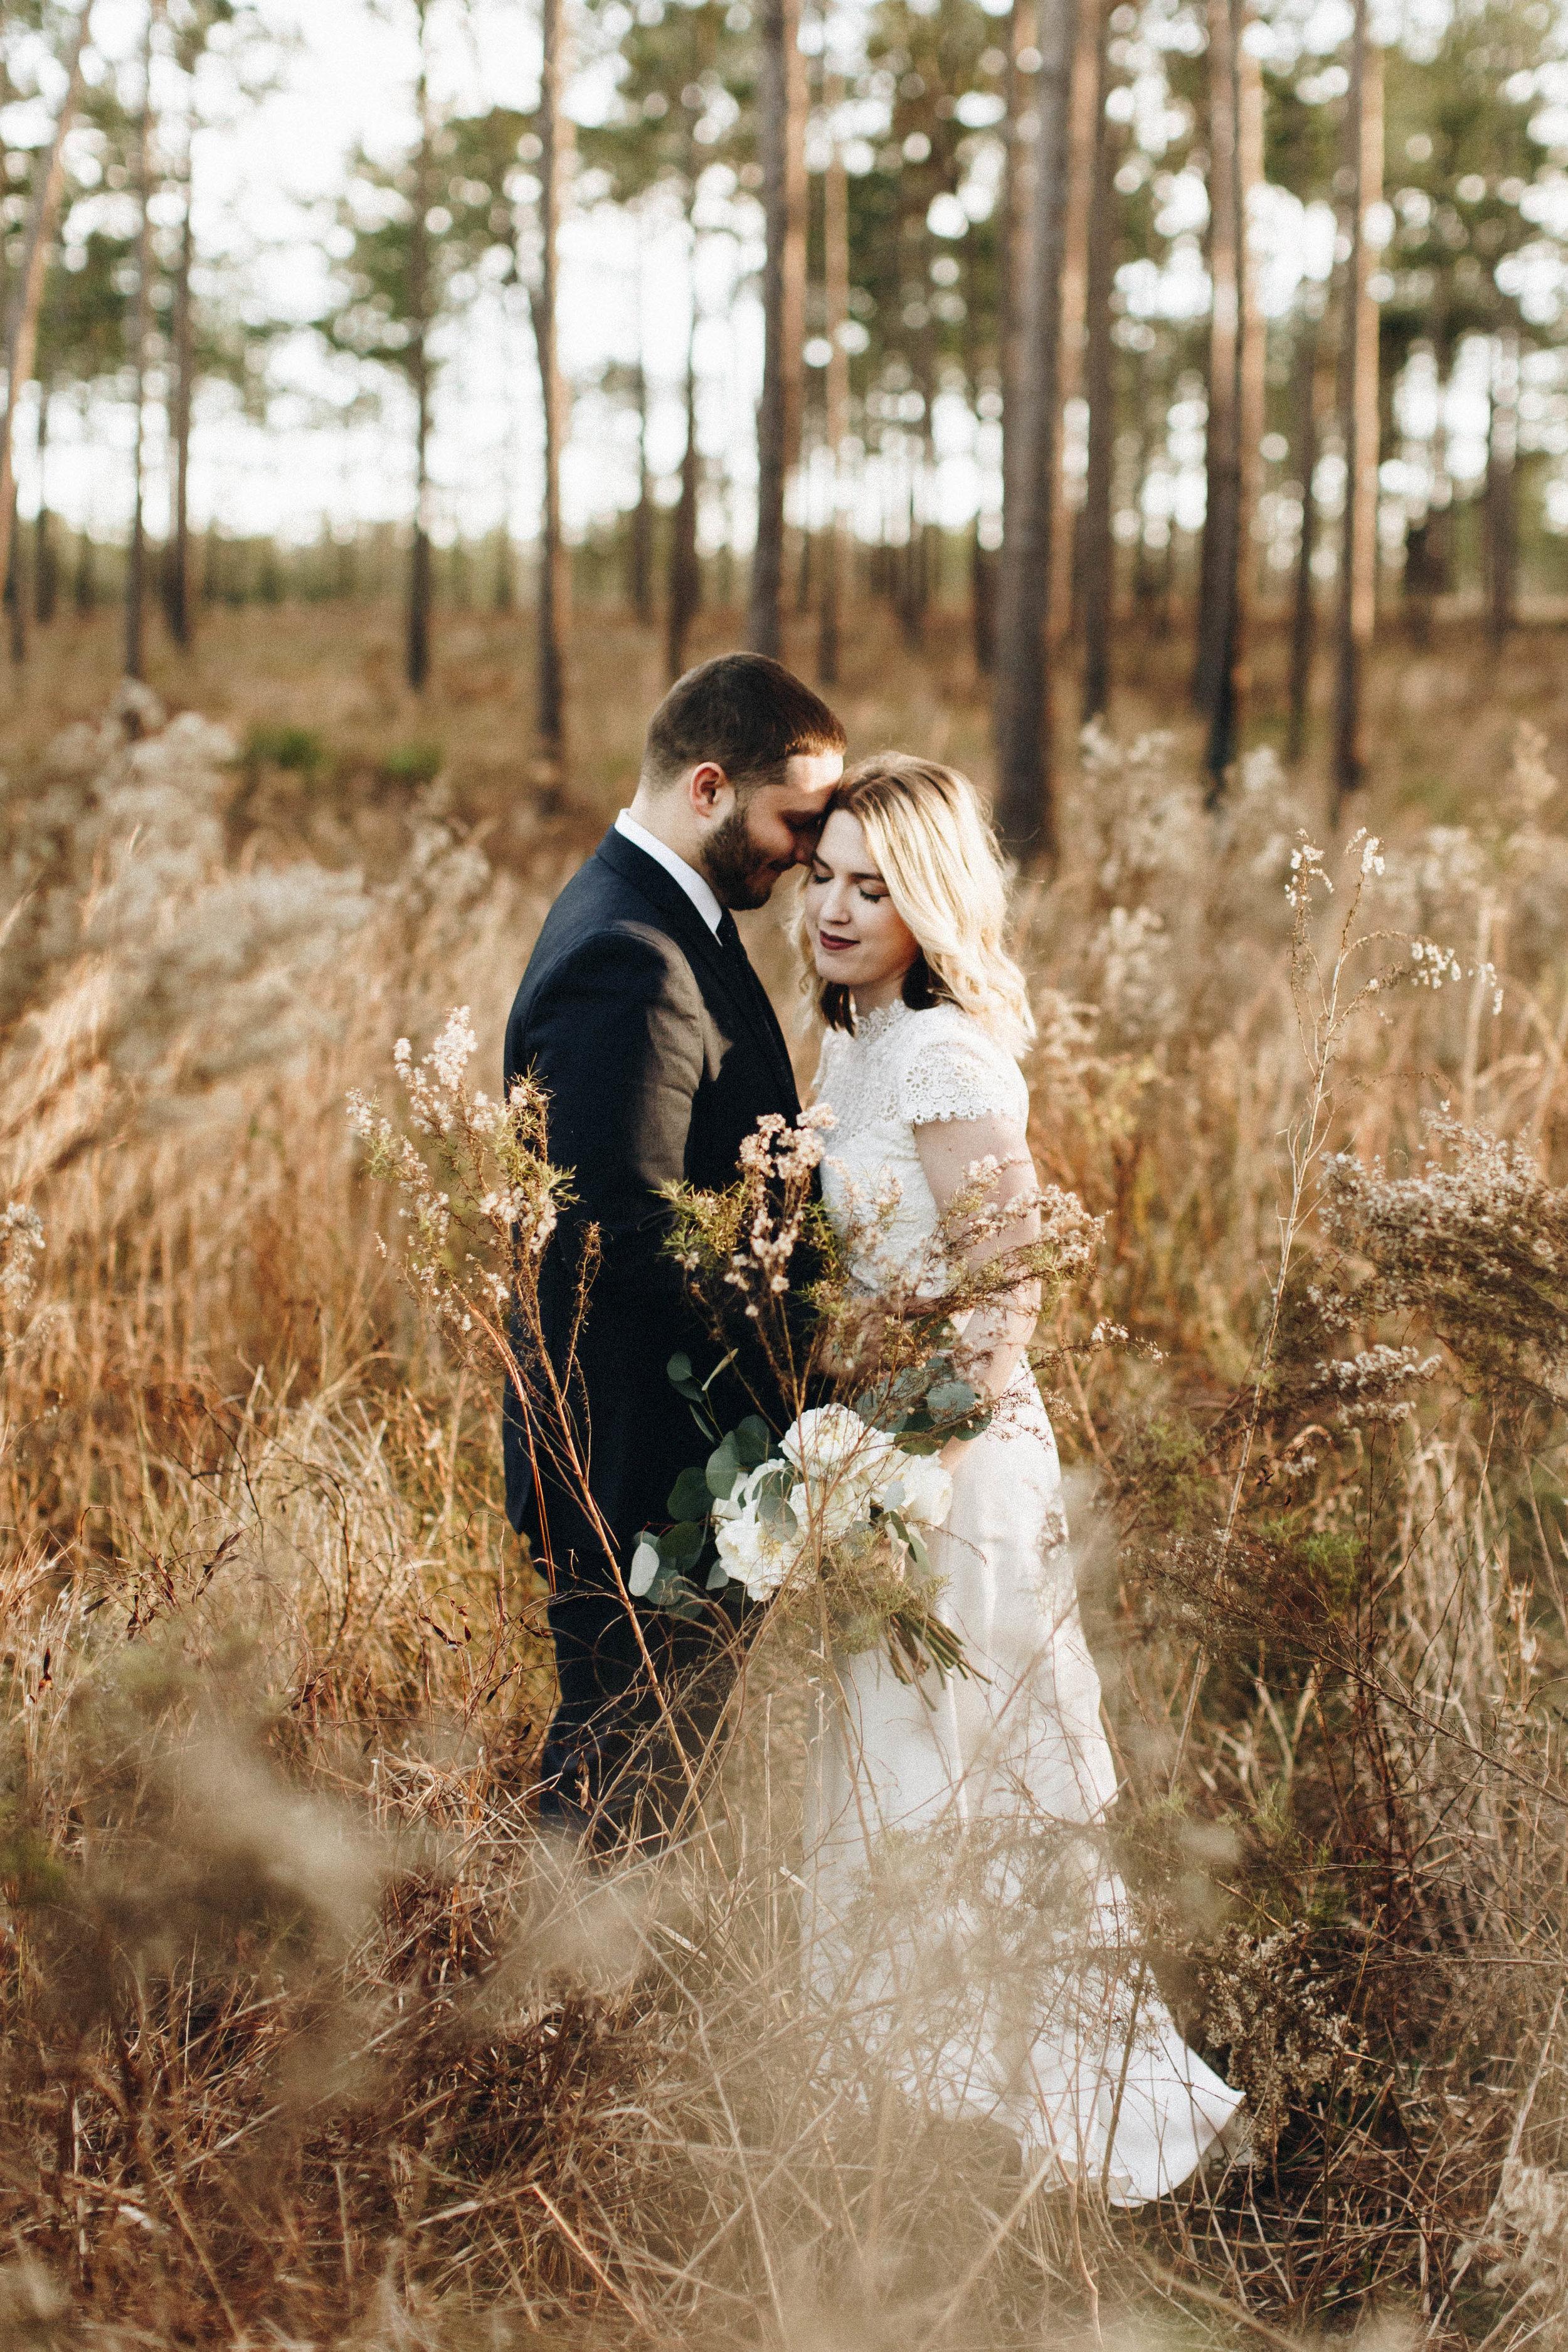 Orlando+wedding+photographer-2.jpeg